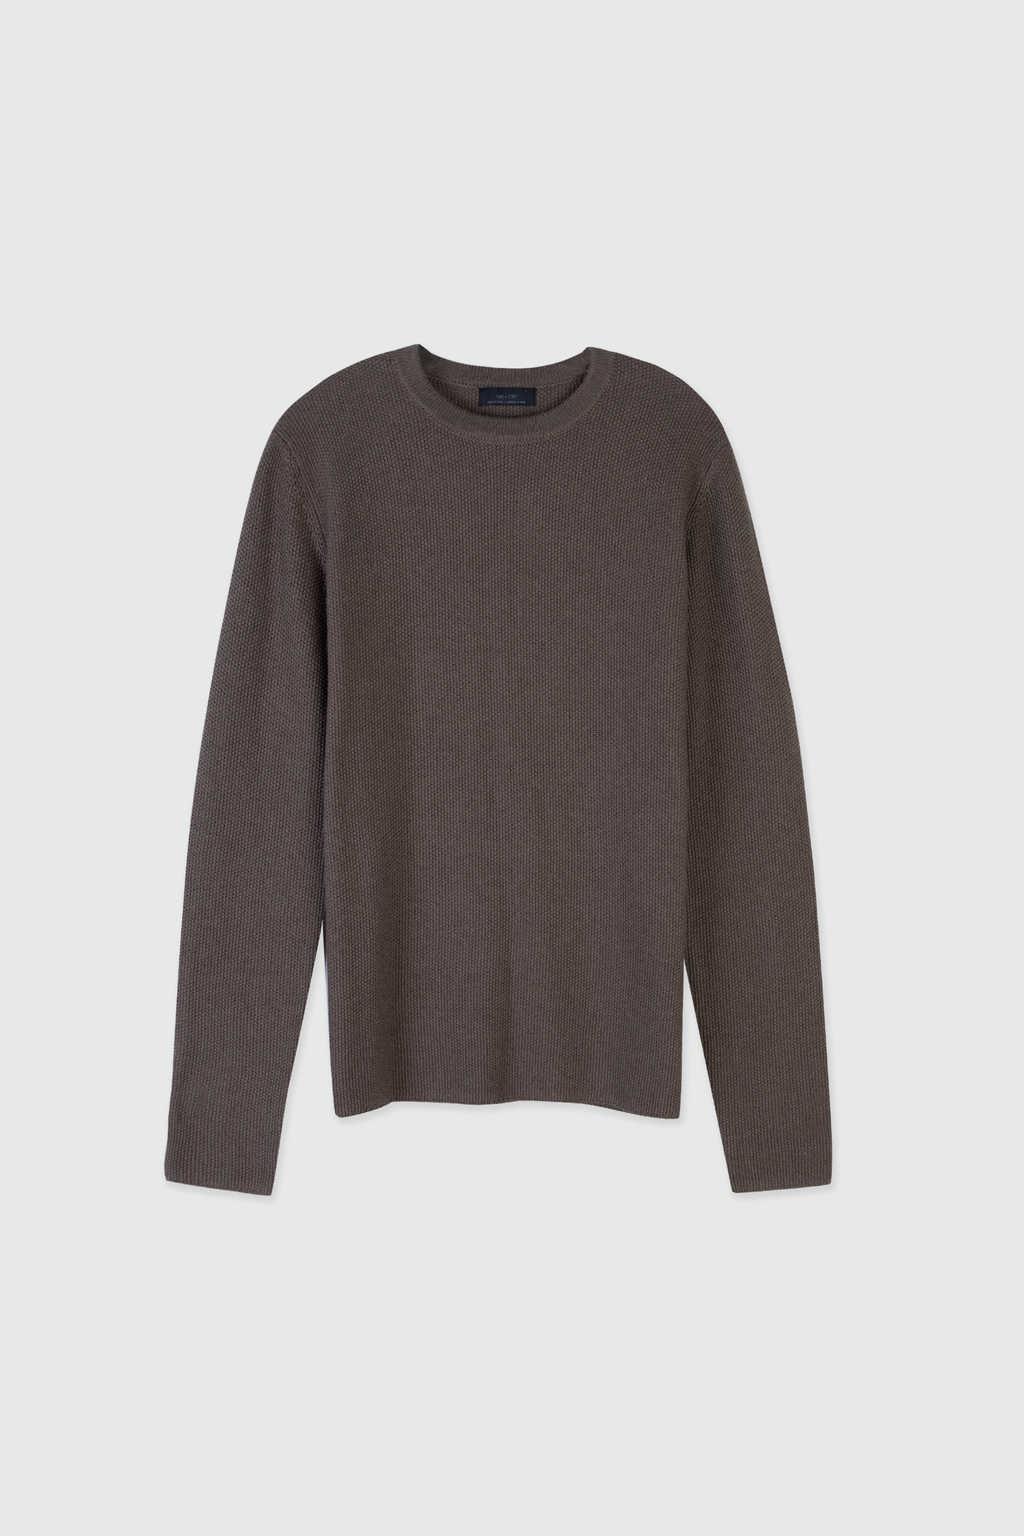 Sweater 2849 Olive 12